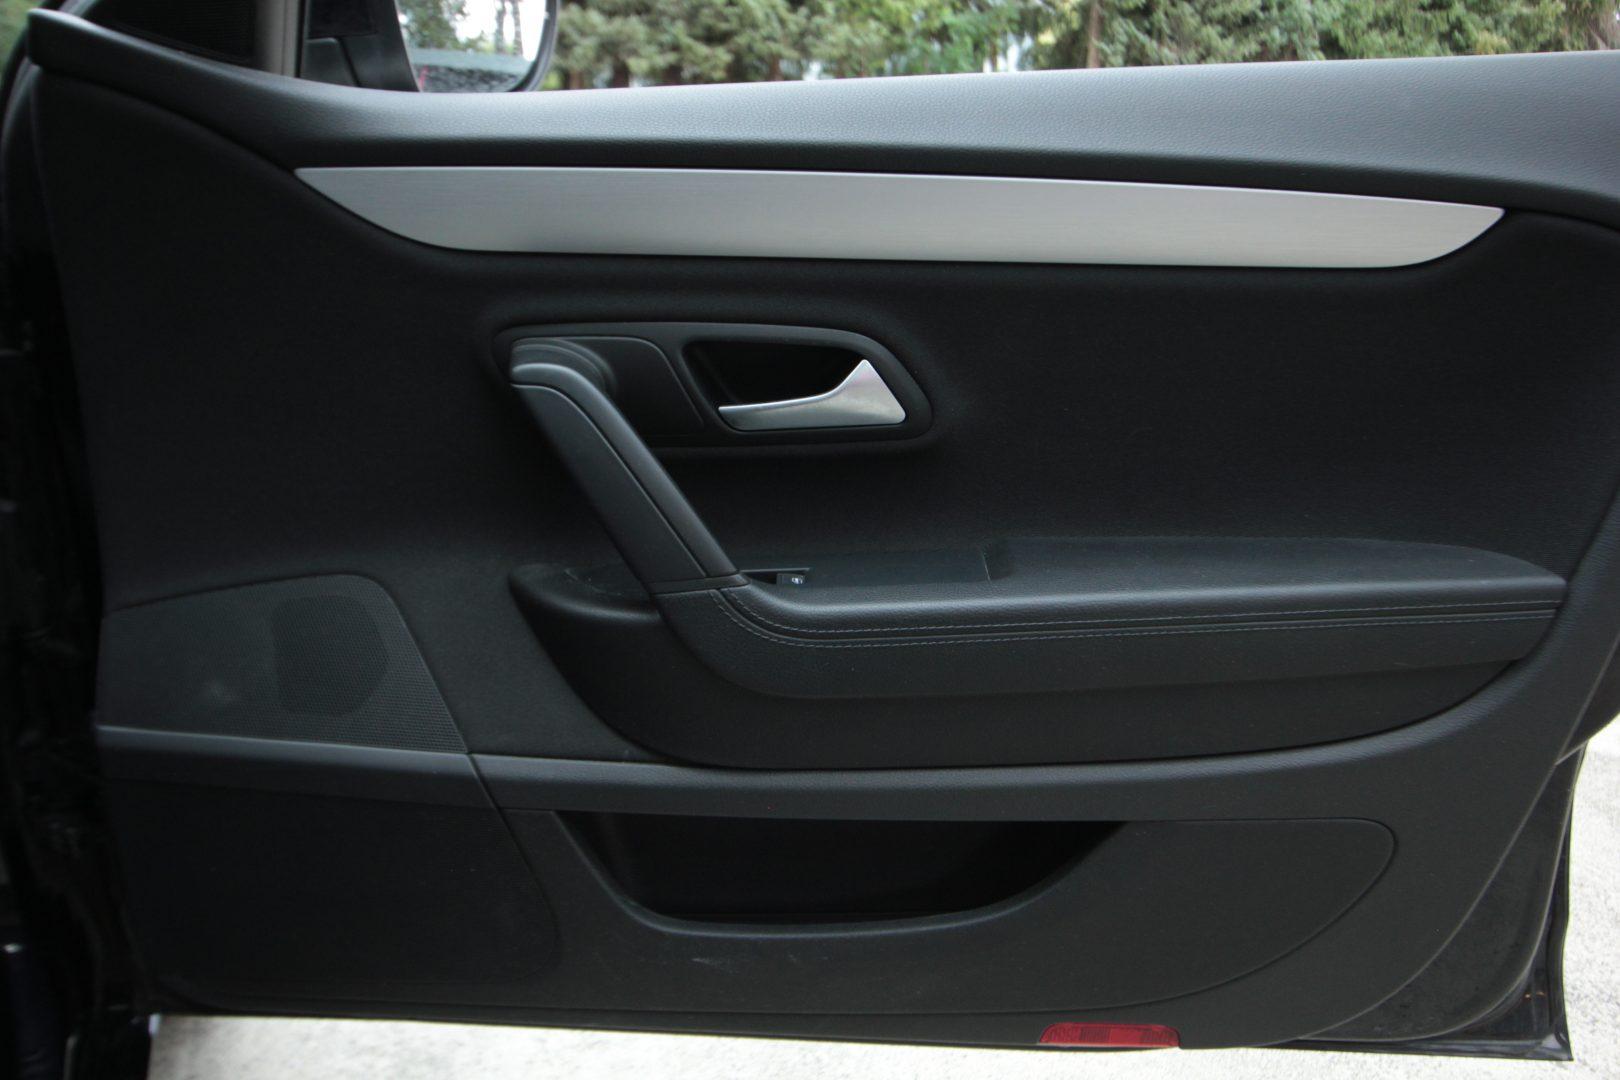 AIL VW CC 2.0TDI Basis BMT 4Motion DSG 11